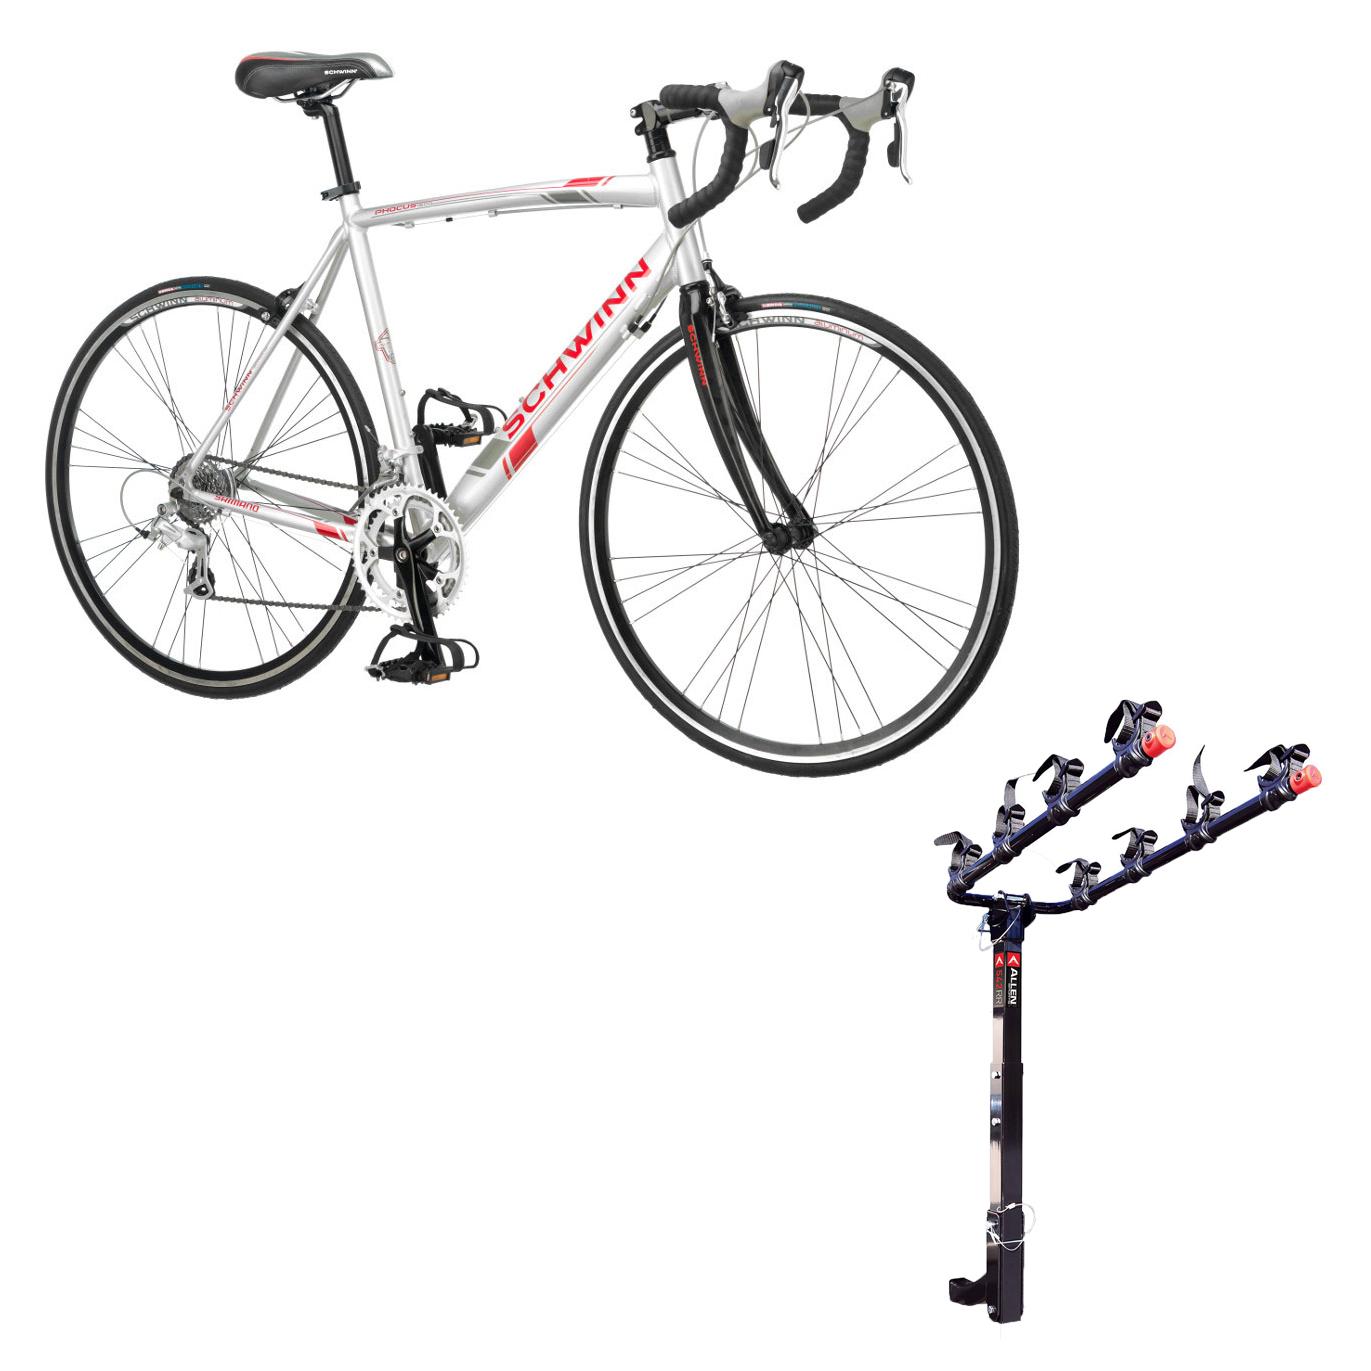 ed2956a07d8 Schwinn 700C Phocus 1600 Womens Drop Bar Road Bicycle & 4 Bike Car ...